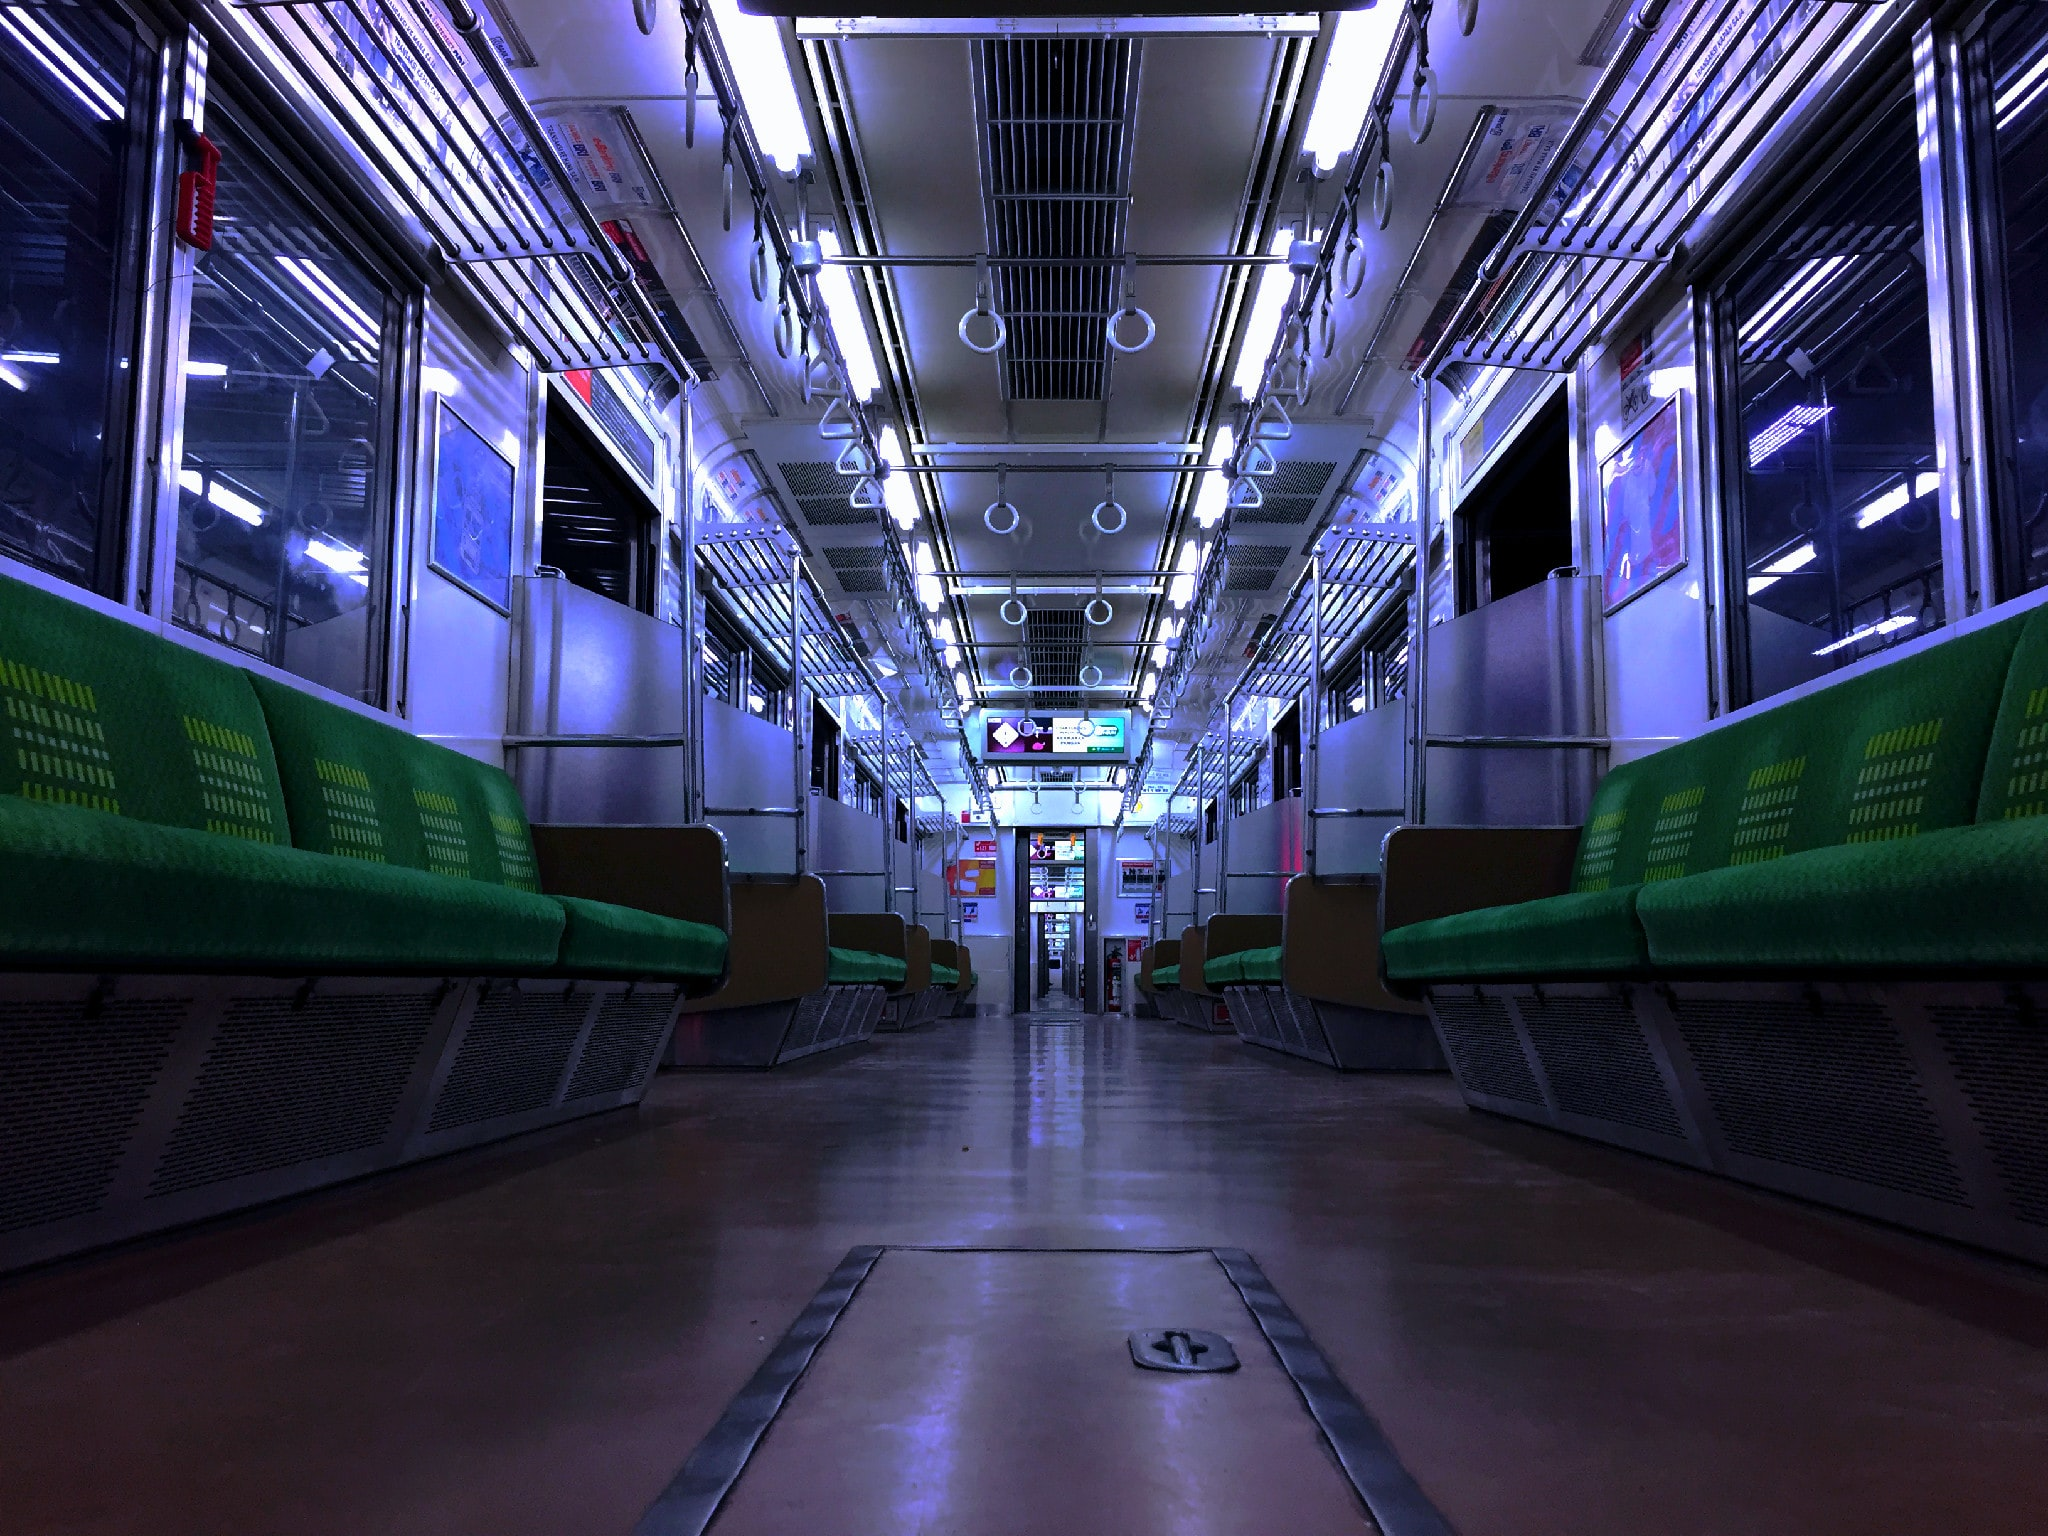 photo of empty train